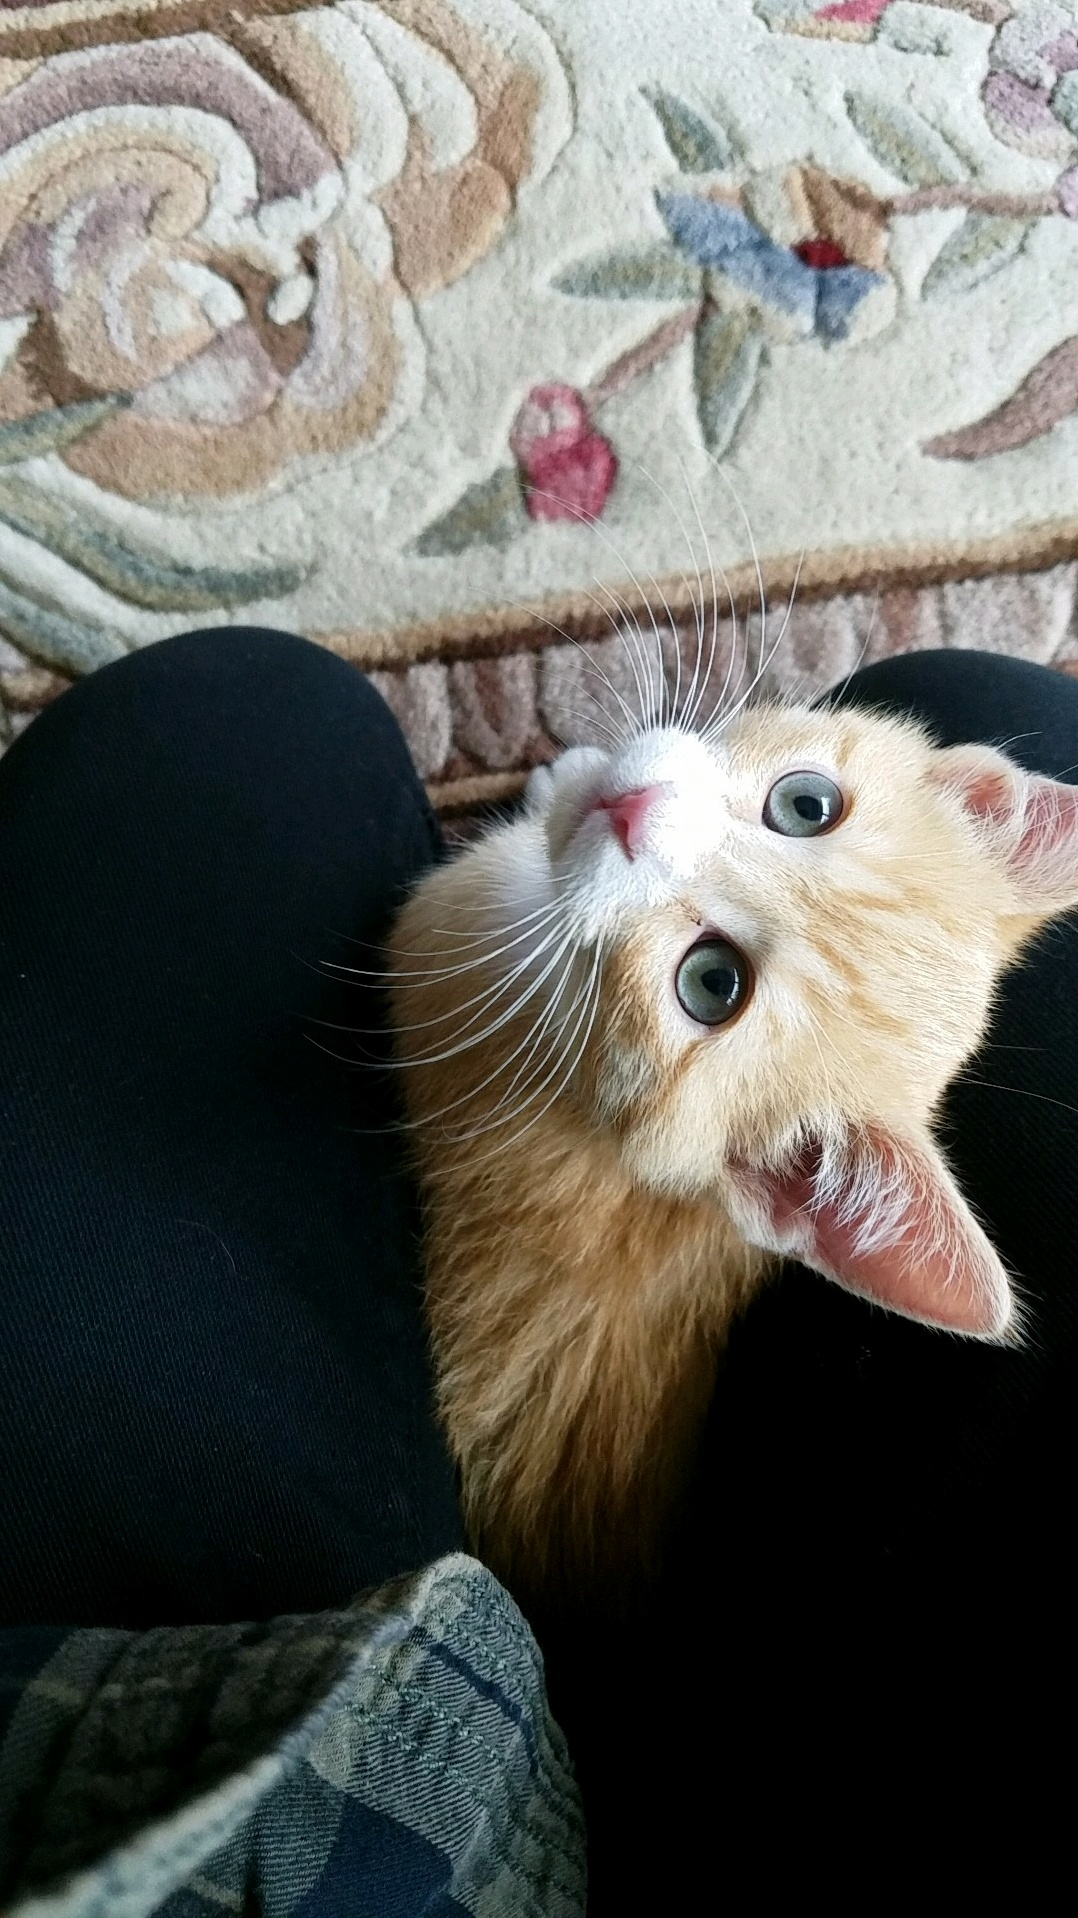 My friends new kitten thomas